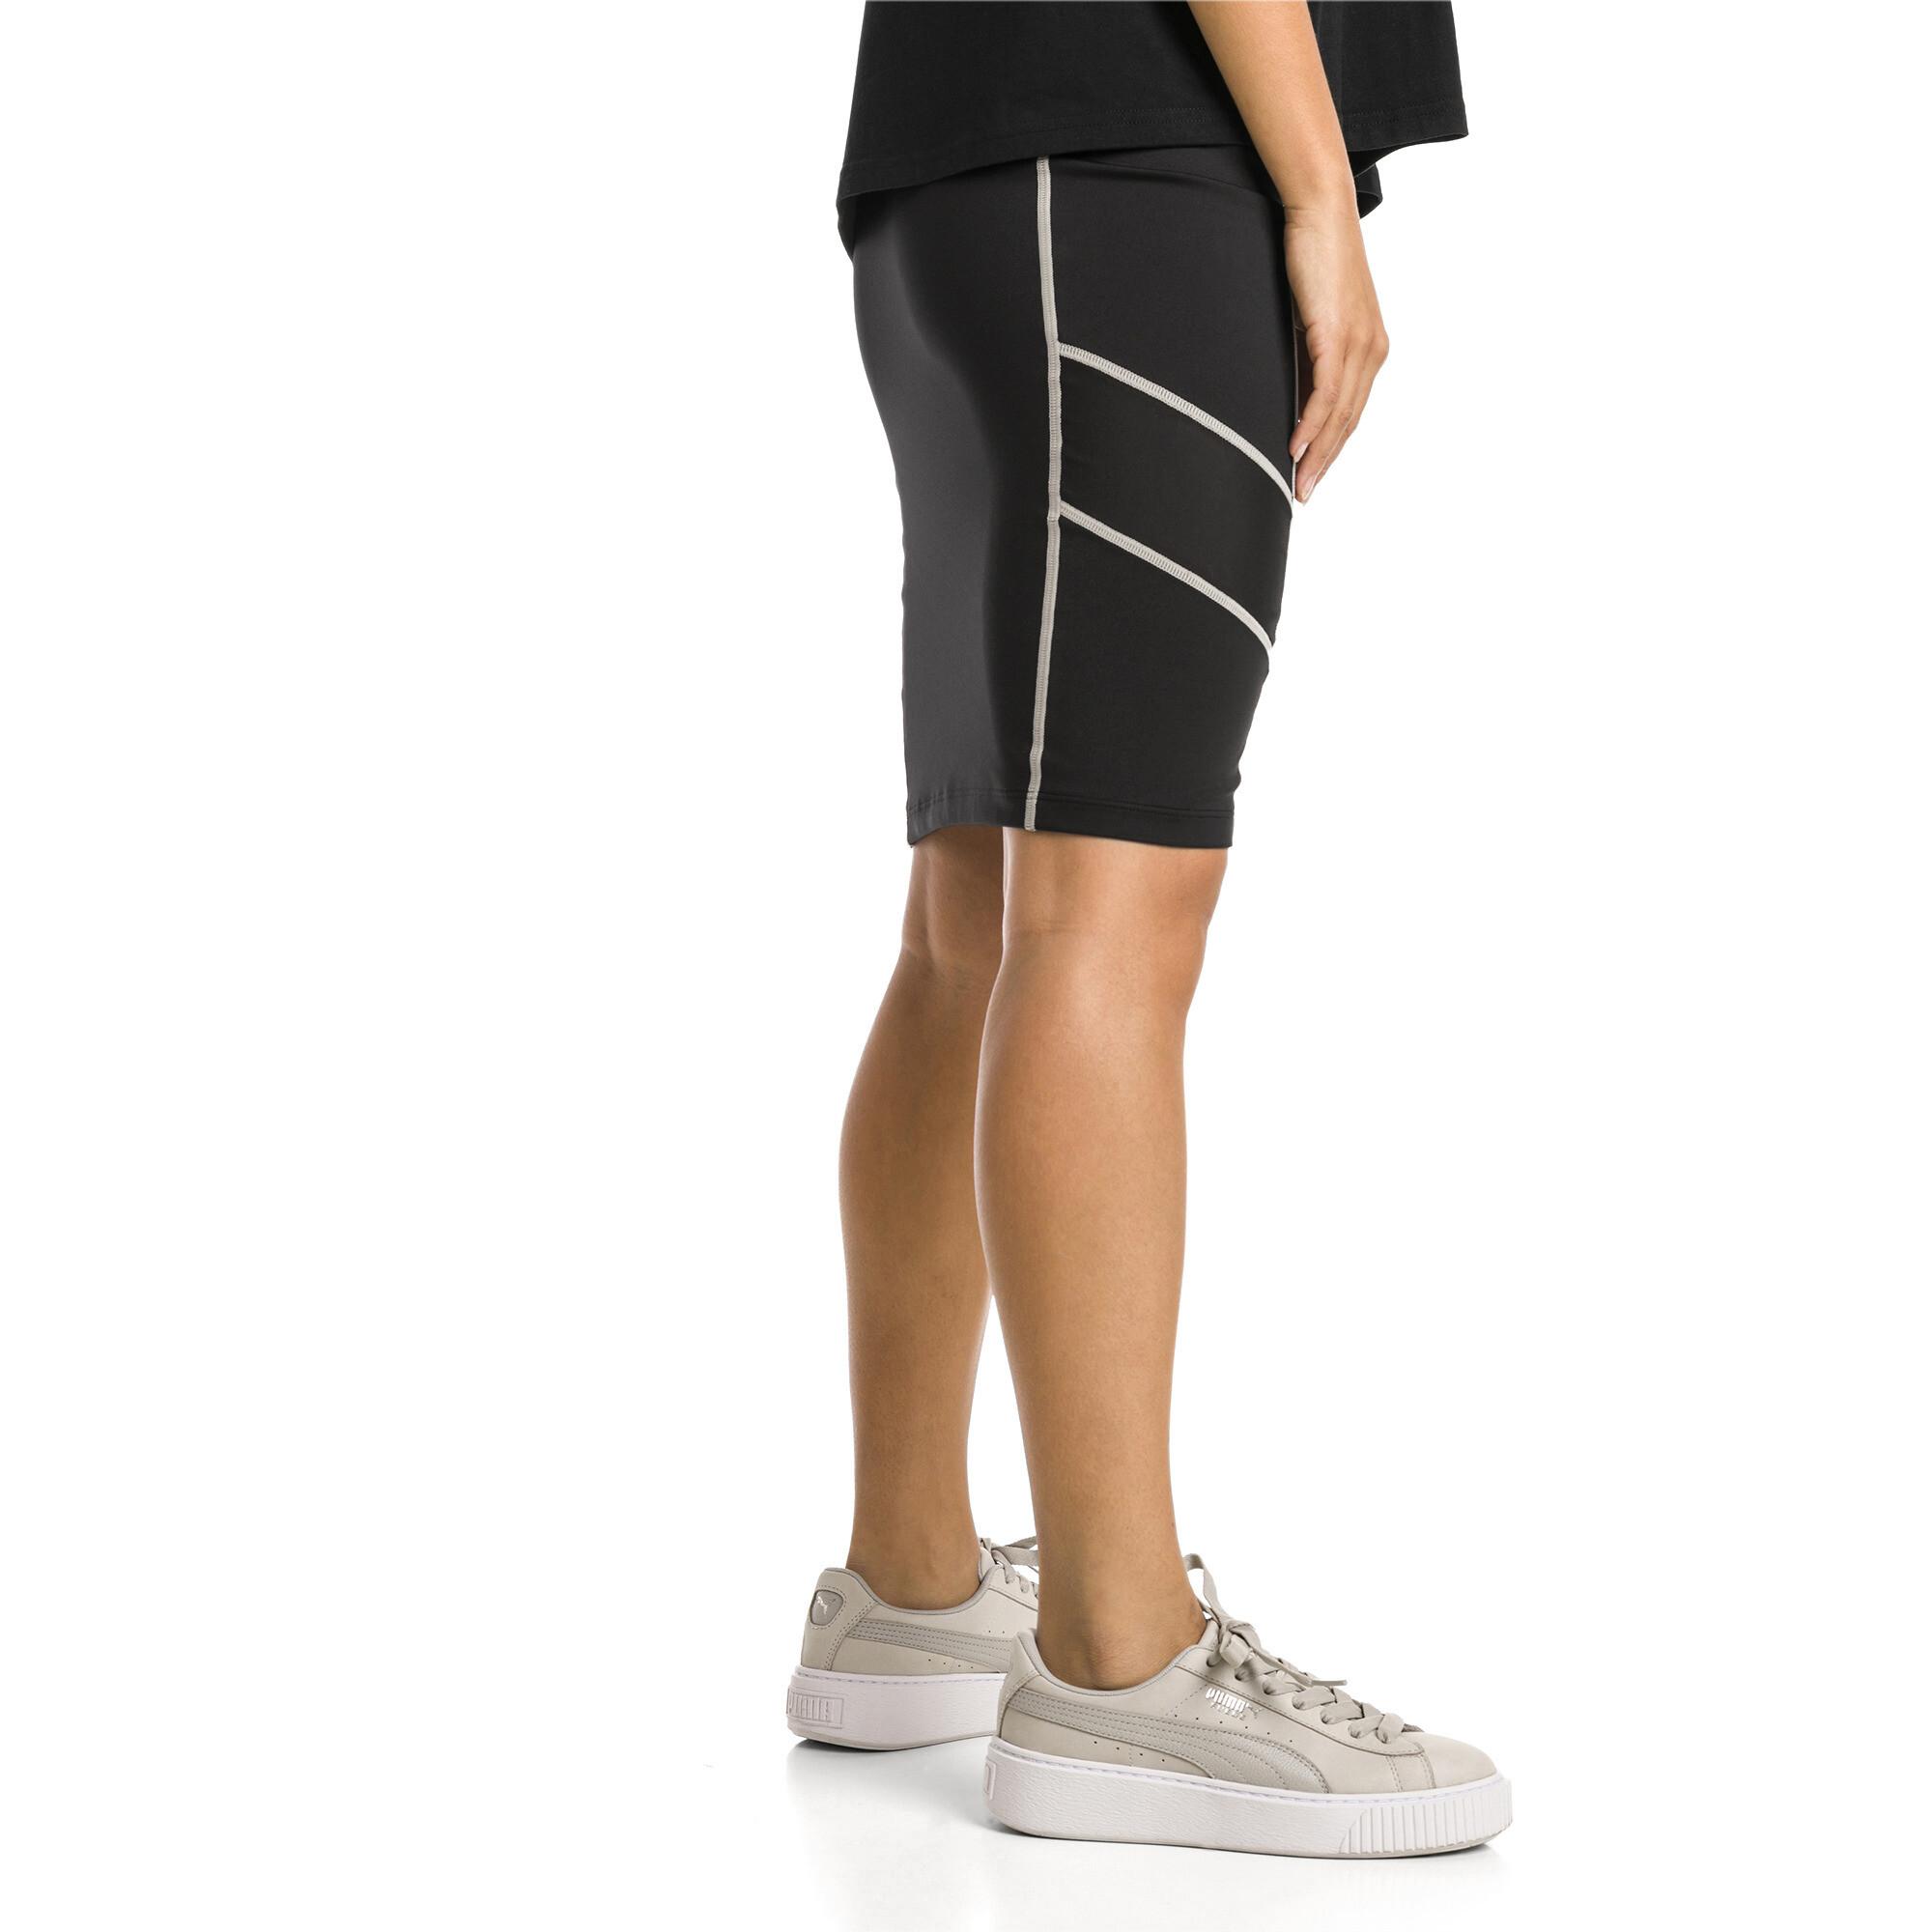 Image Puma TZ Women's Skirt #2